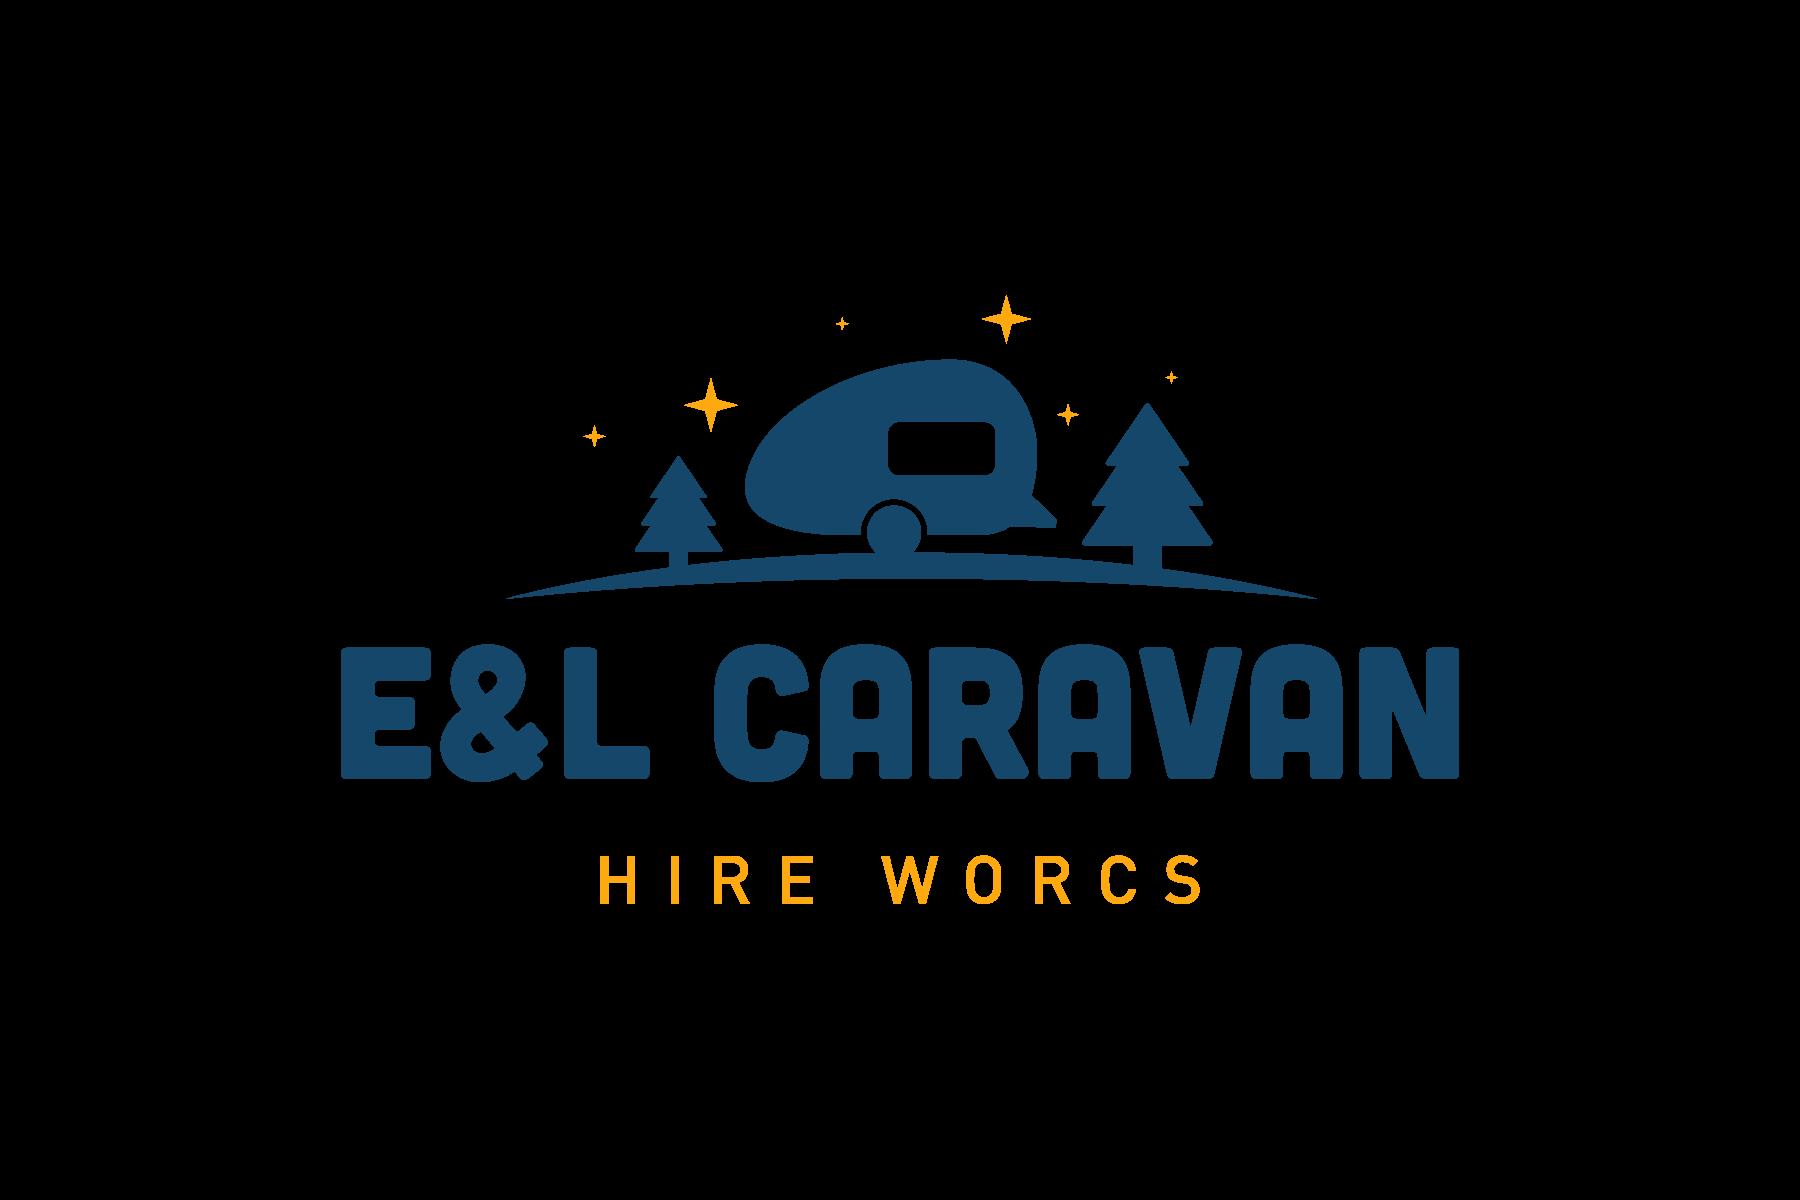 E&L Caravan Logo